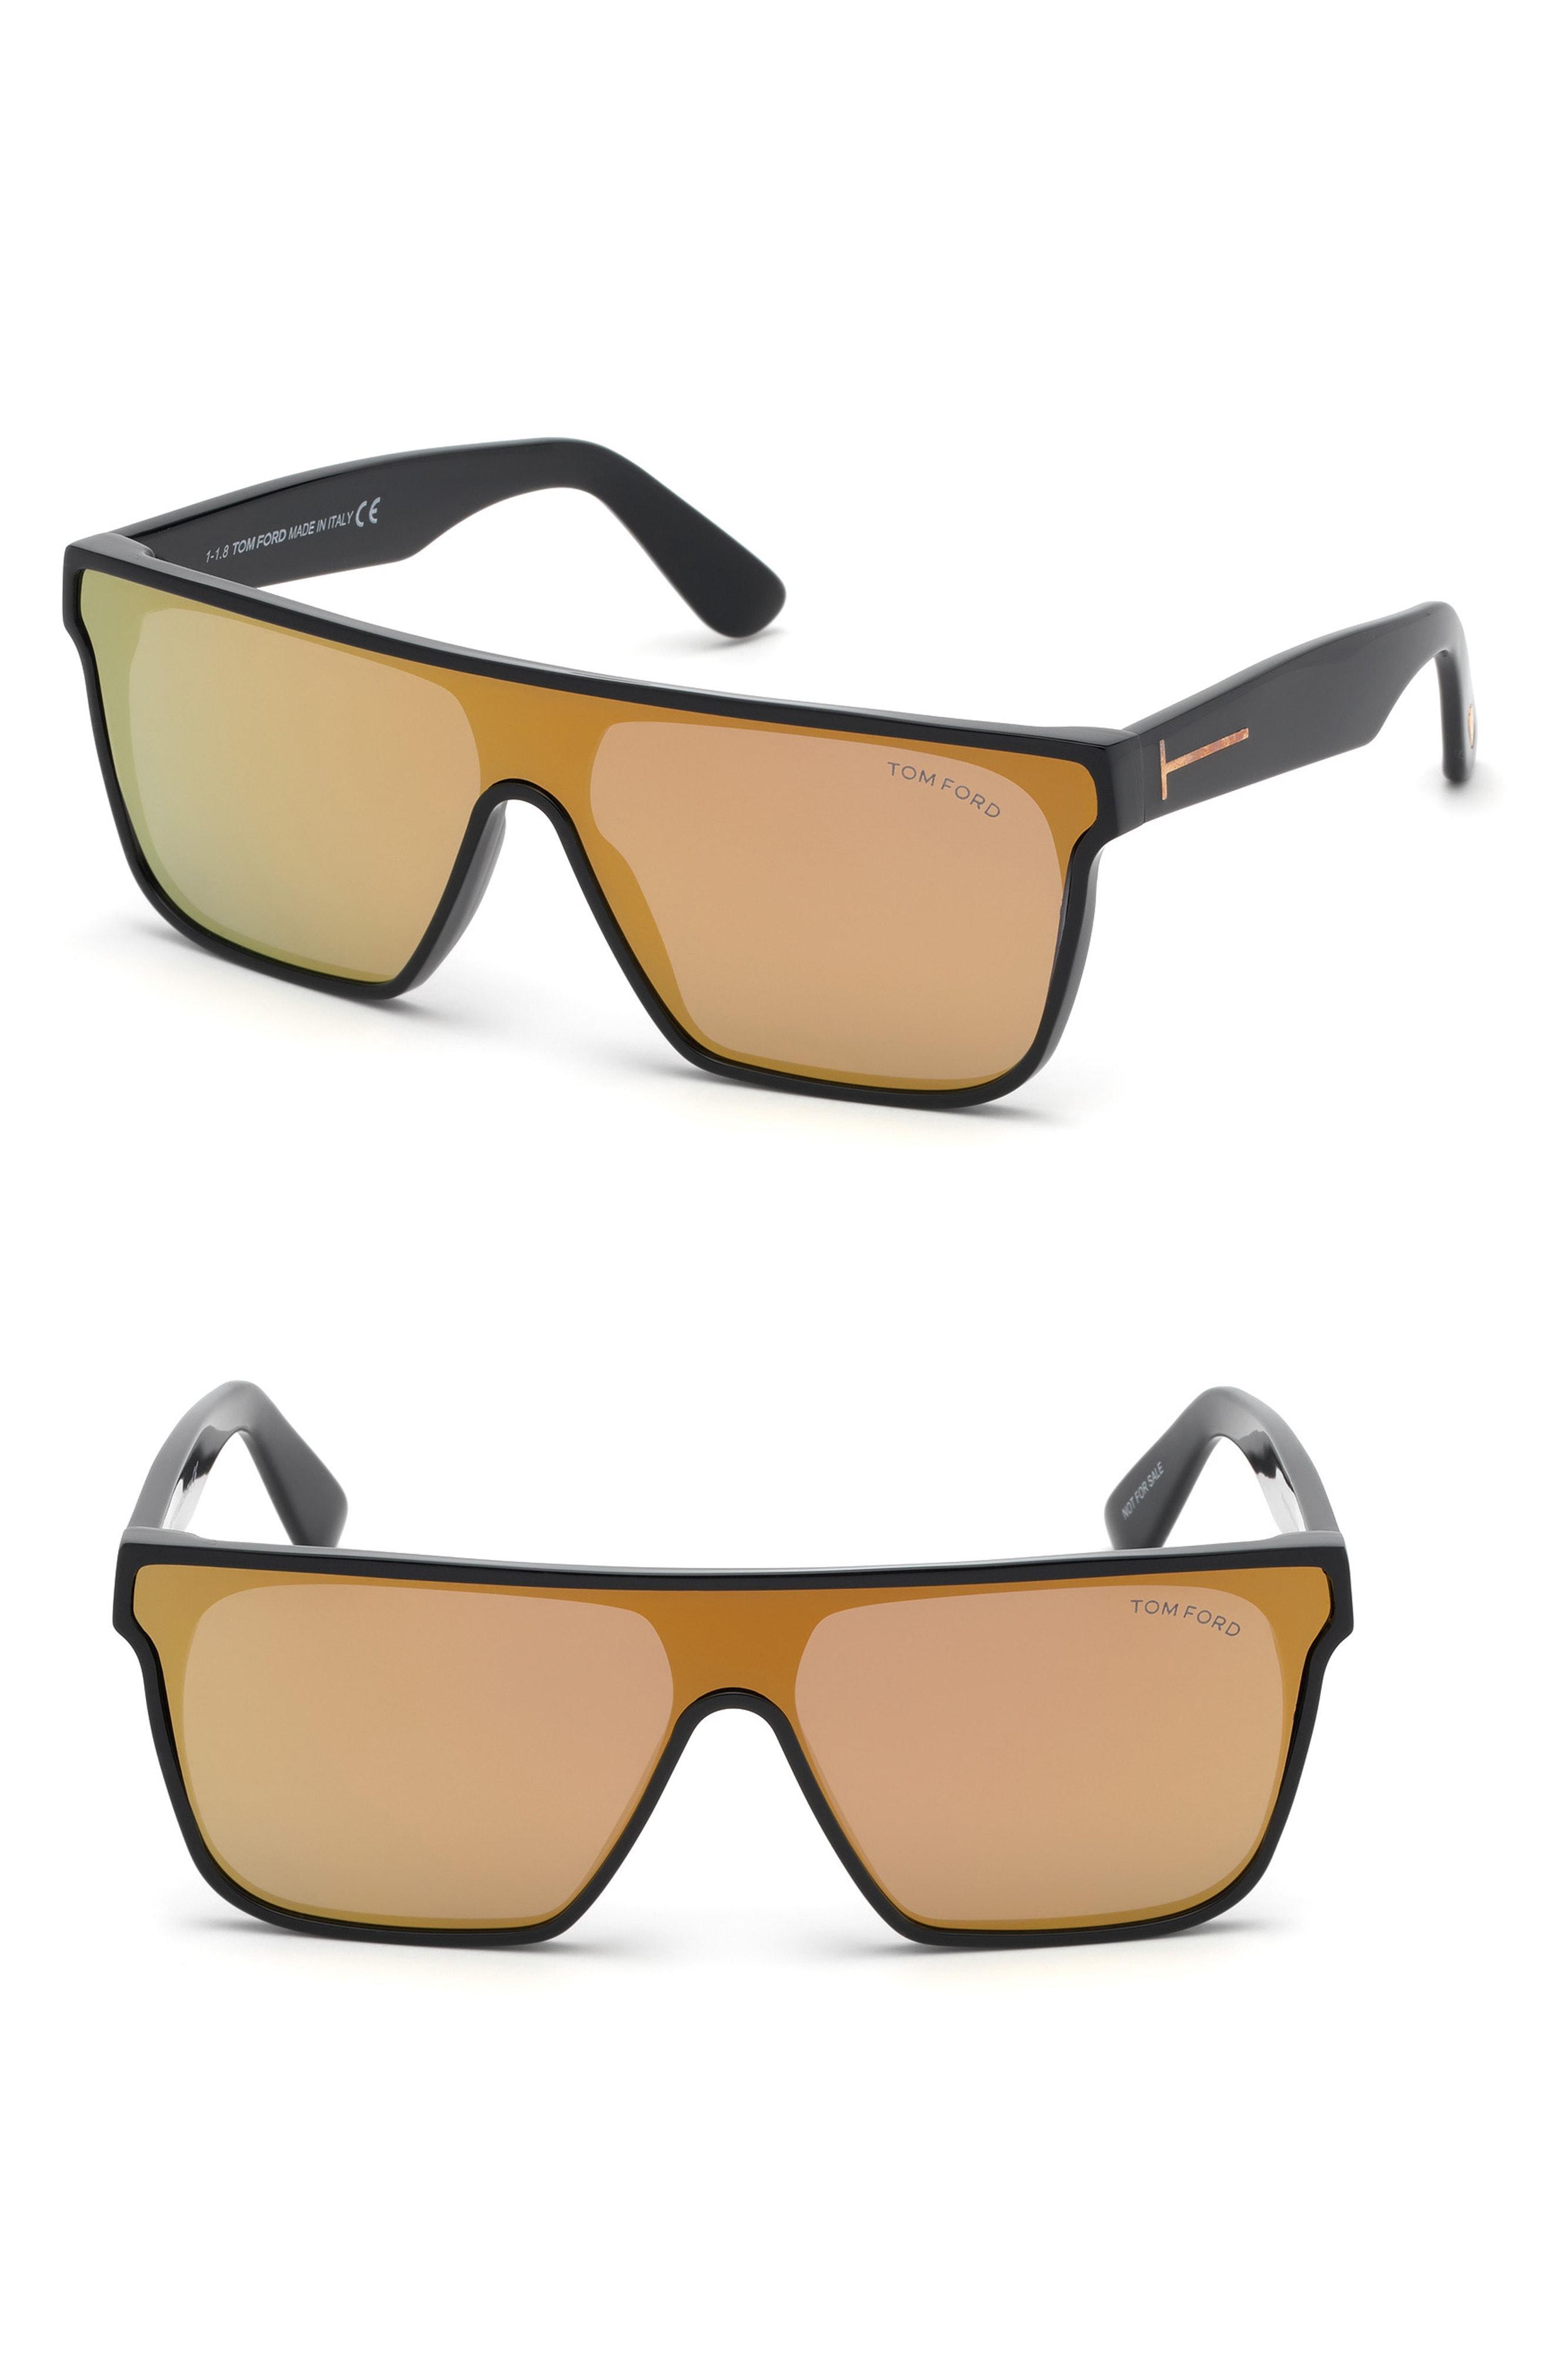 c53ac922867 Tom Ford - 140mm Shield Sunglasses - Shiny Black  Smoke for Men - Lyst.  View fullscreen